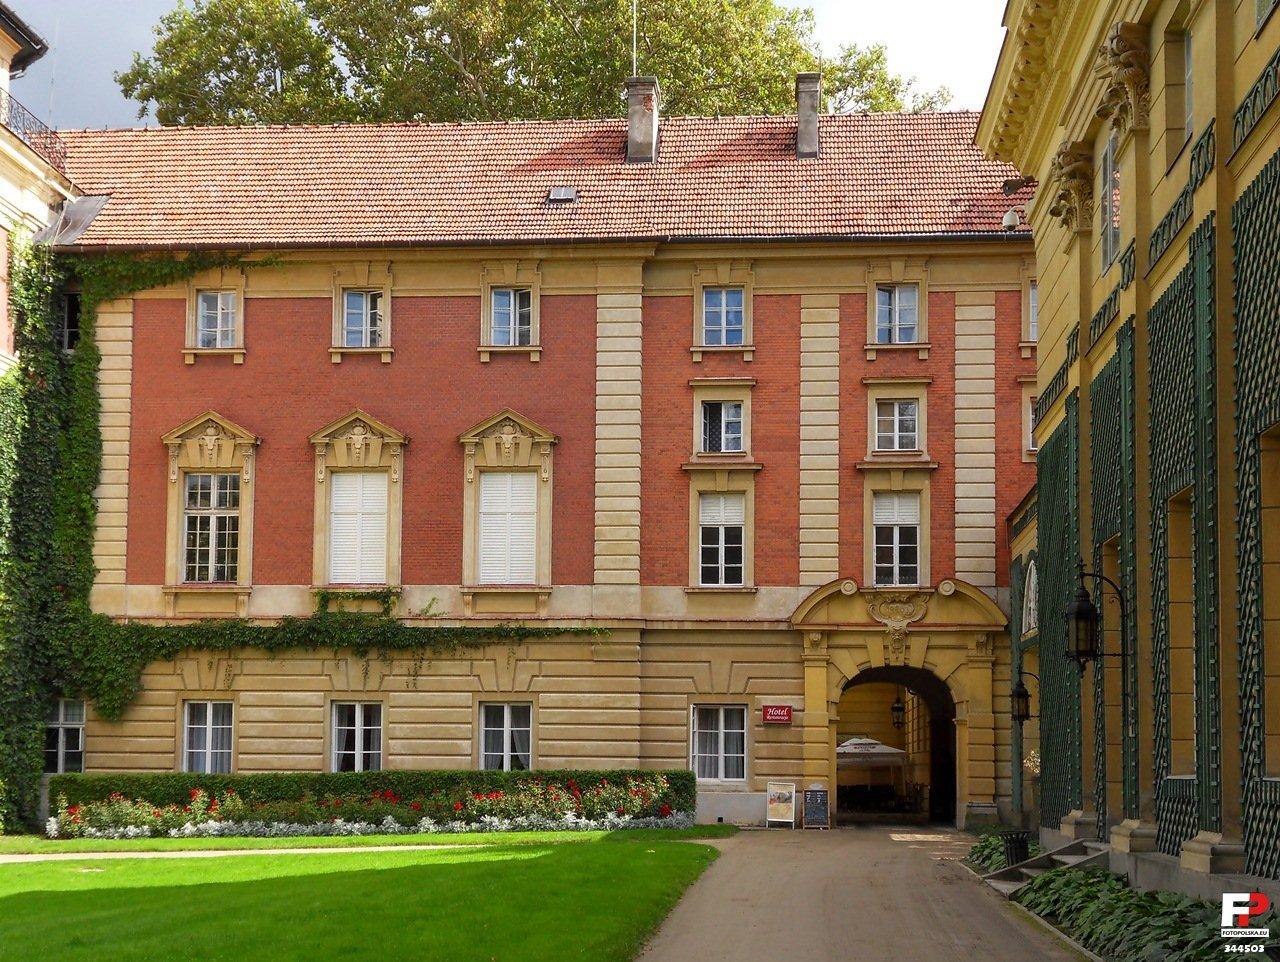 Łańcut, Muzeum - Zamek - fotopolska.eu (344503).jpg